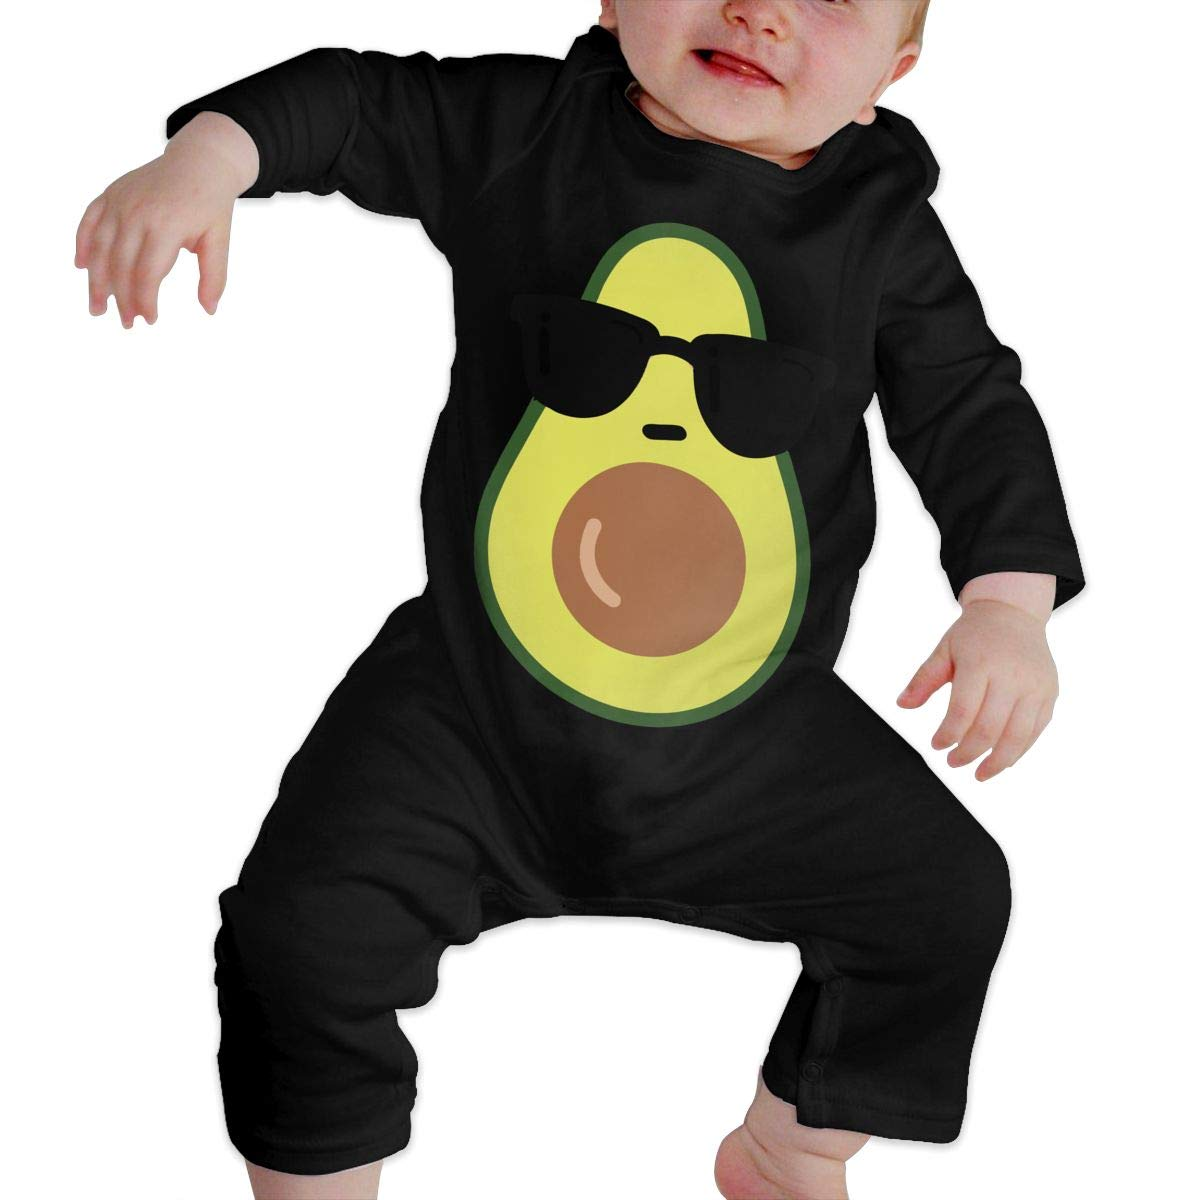 UGFGF-S3 Cool Avocado Baby Boy Long Sleeve Bodysuit Baby Rompers